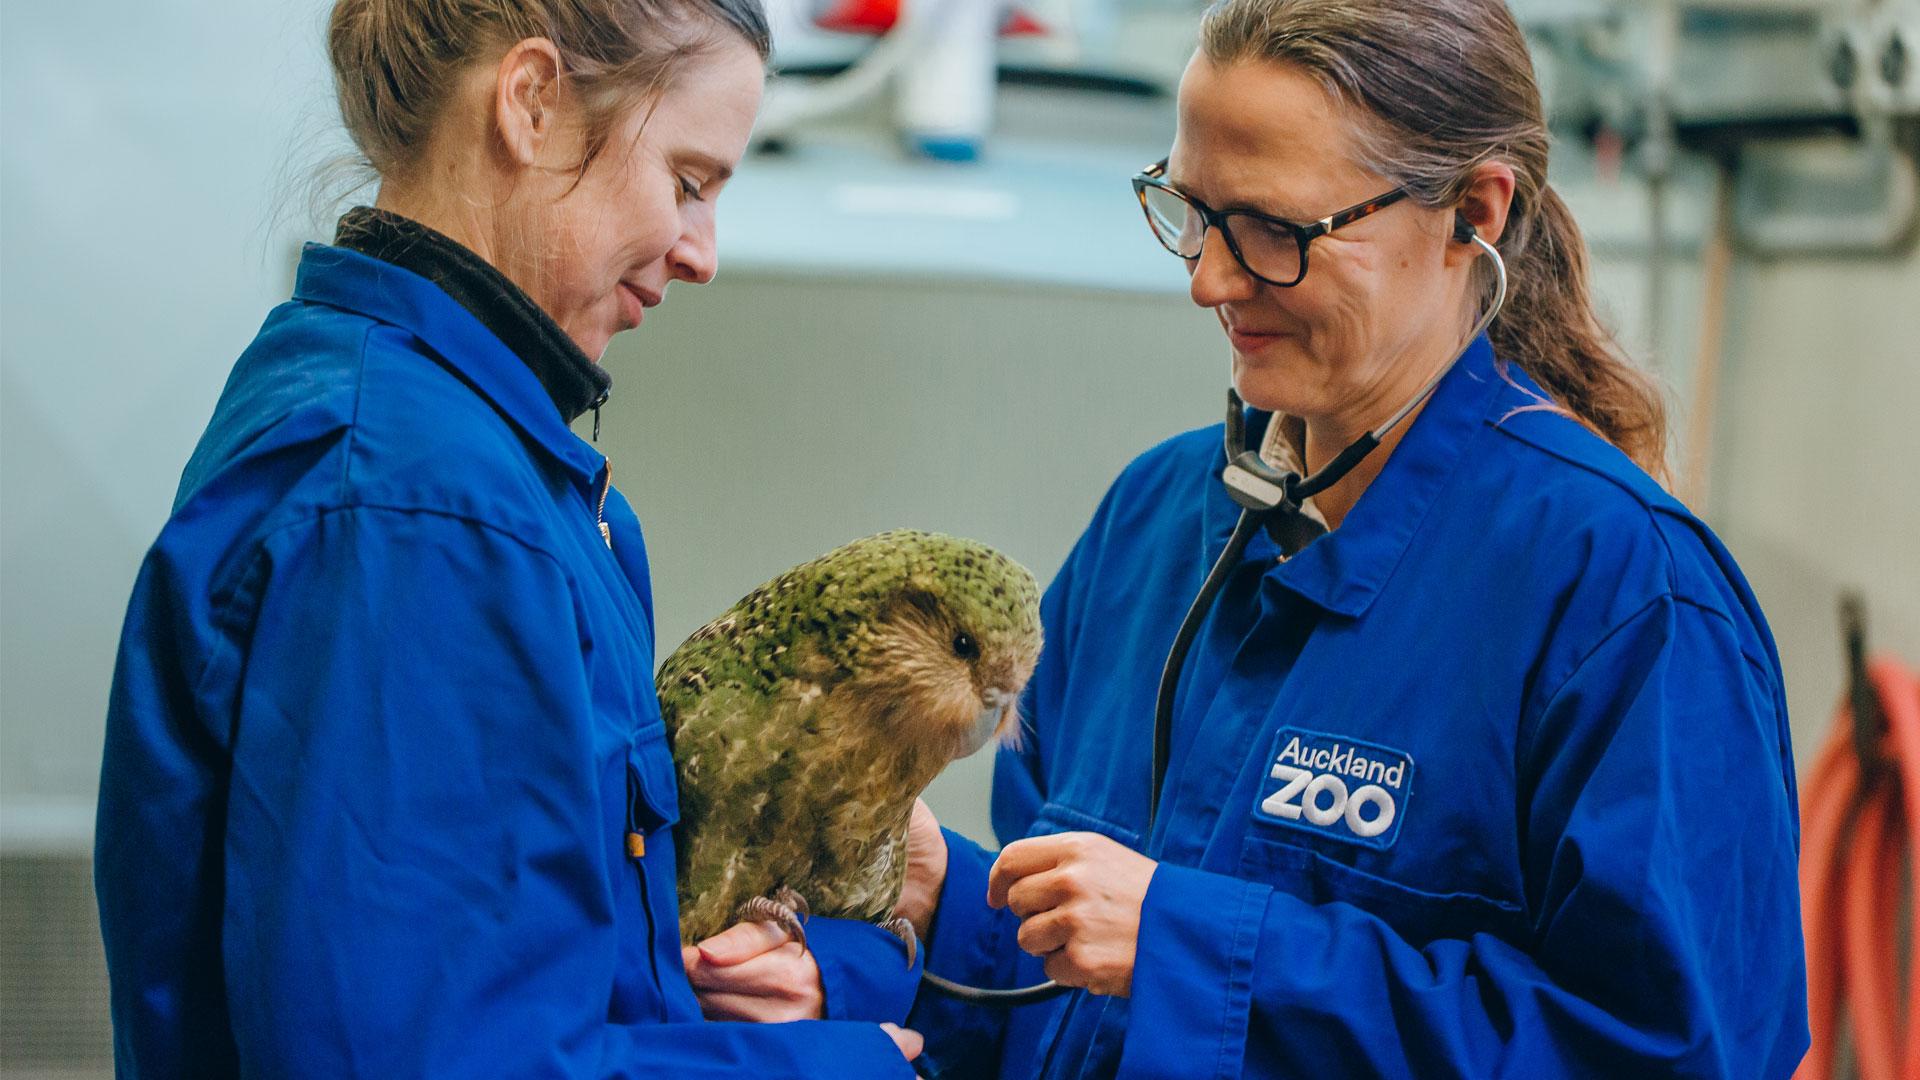 https://rfacdn.nz/zoo/assets/media/kakapo-vori-gallery-3.jpg